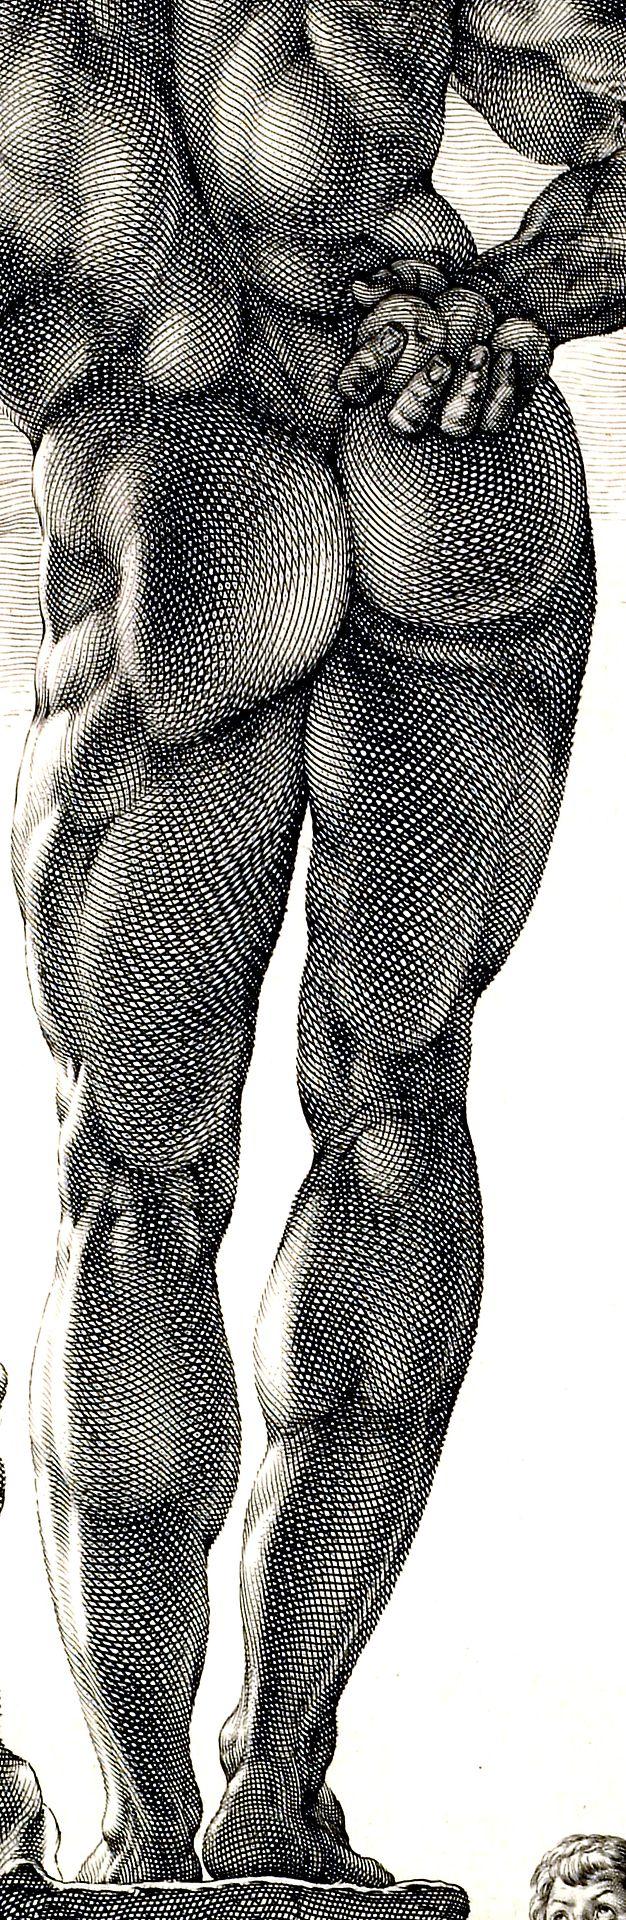 Farnese Hercules (detail), engraving, c. 1592 // by Hendrick Goltzius,  Metropolitan Museum of Art